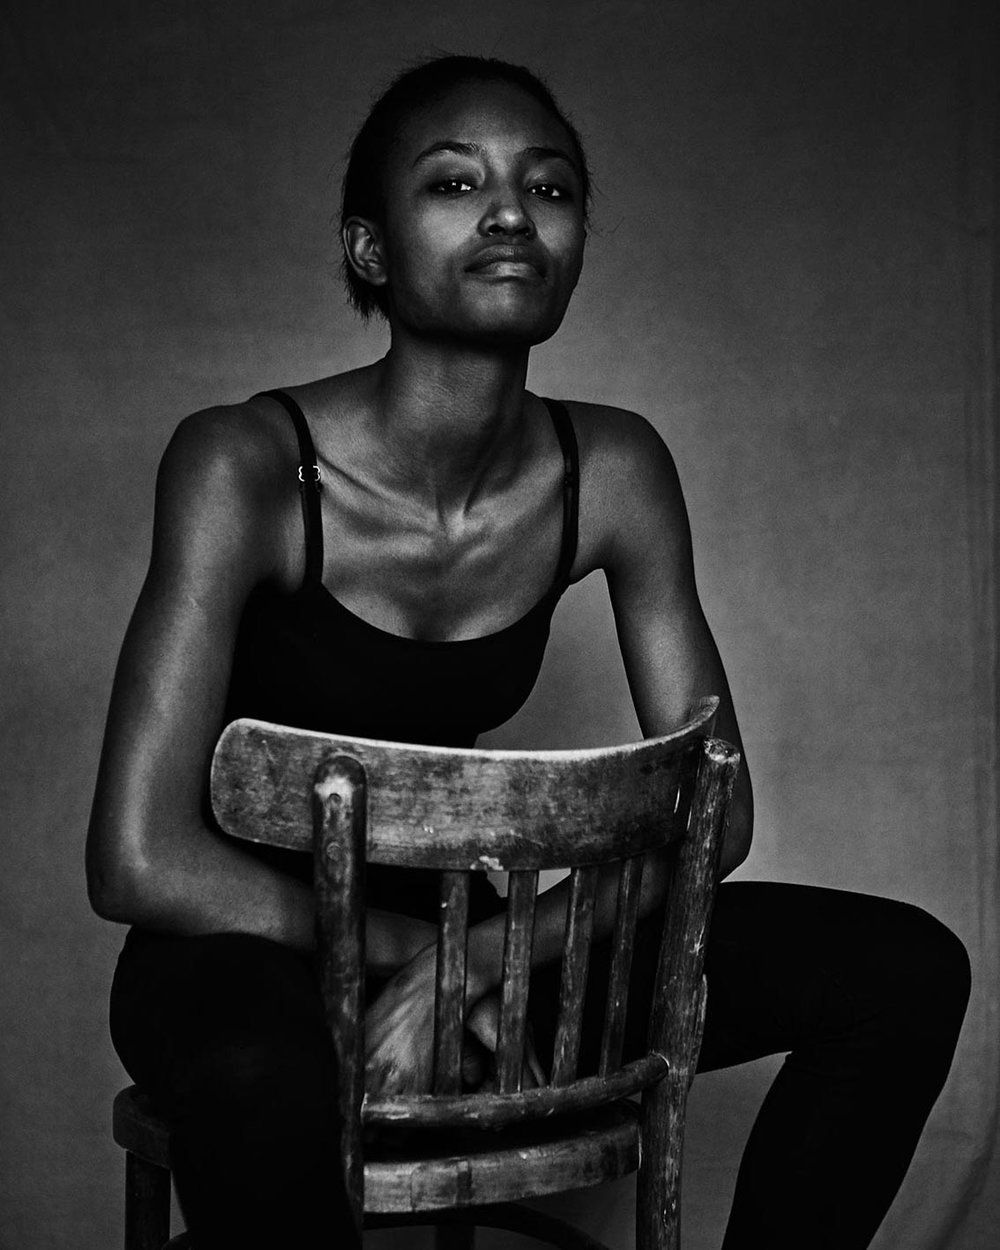 Alicia-Burke-Models1_218cropped.jpg